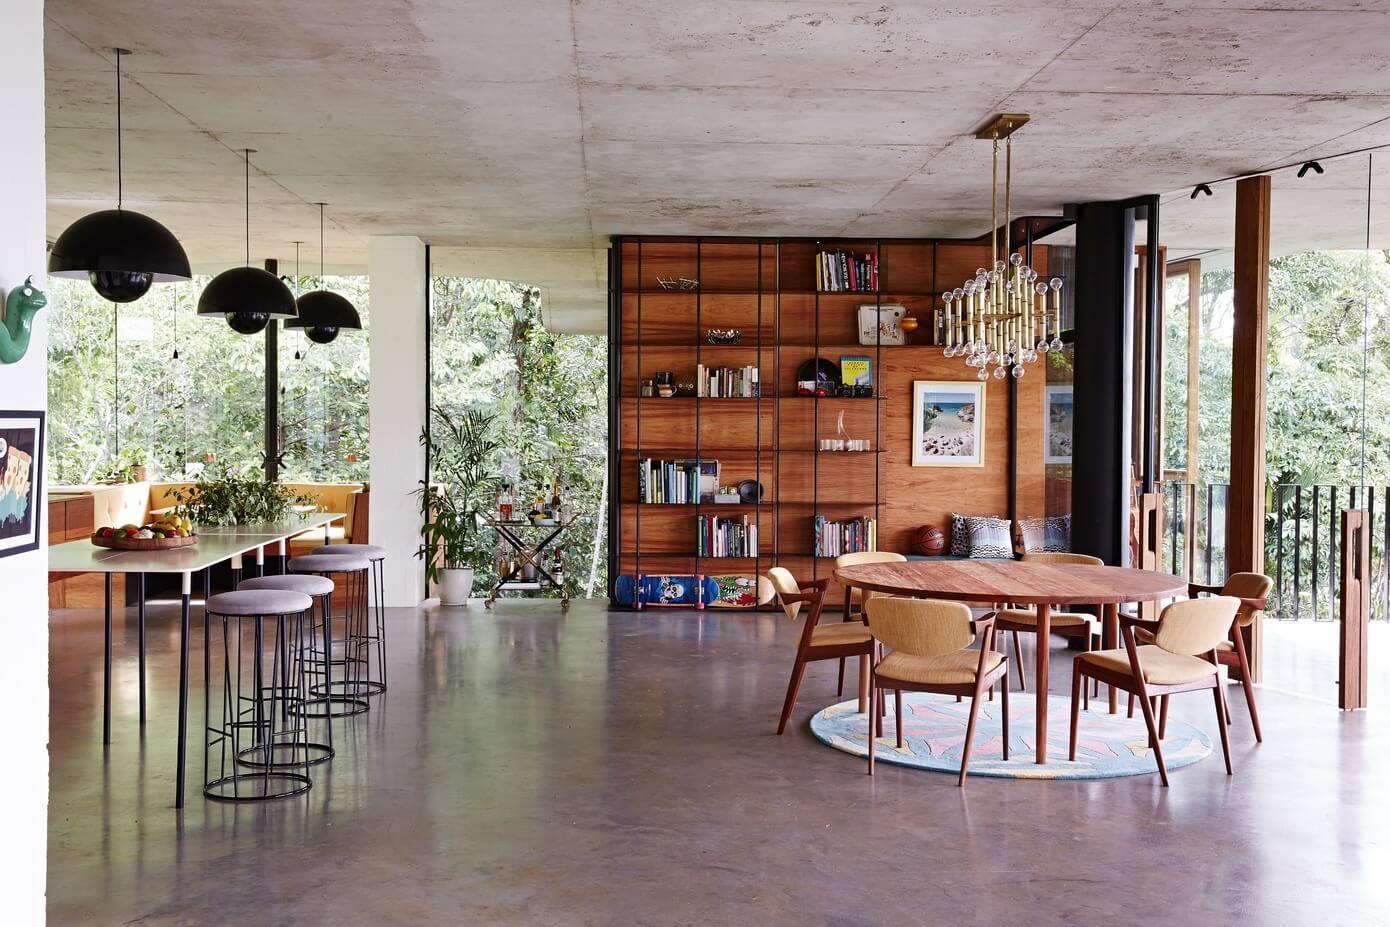 planchonella-house-jesse-bennett-architect-02